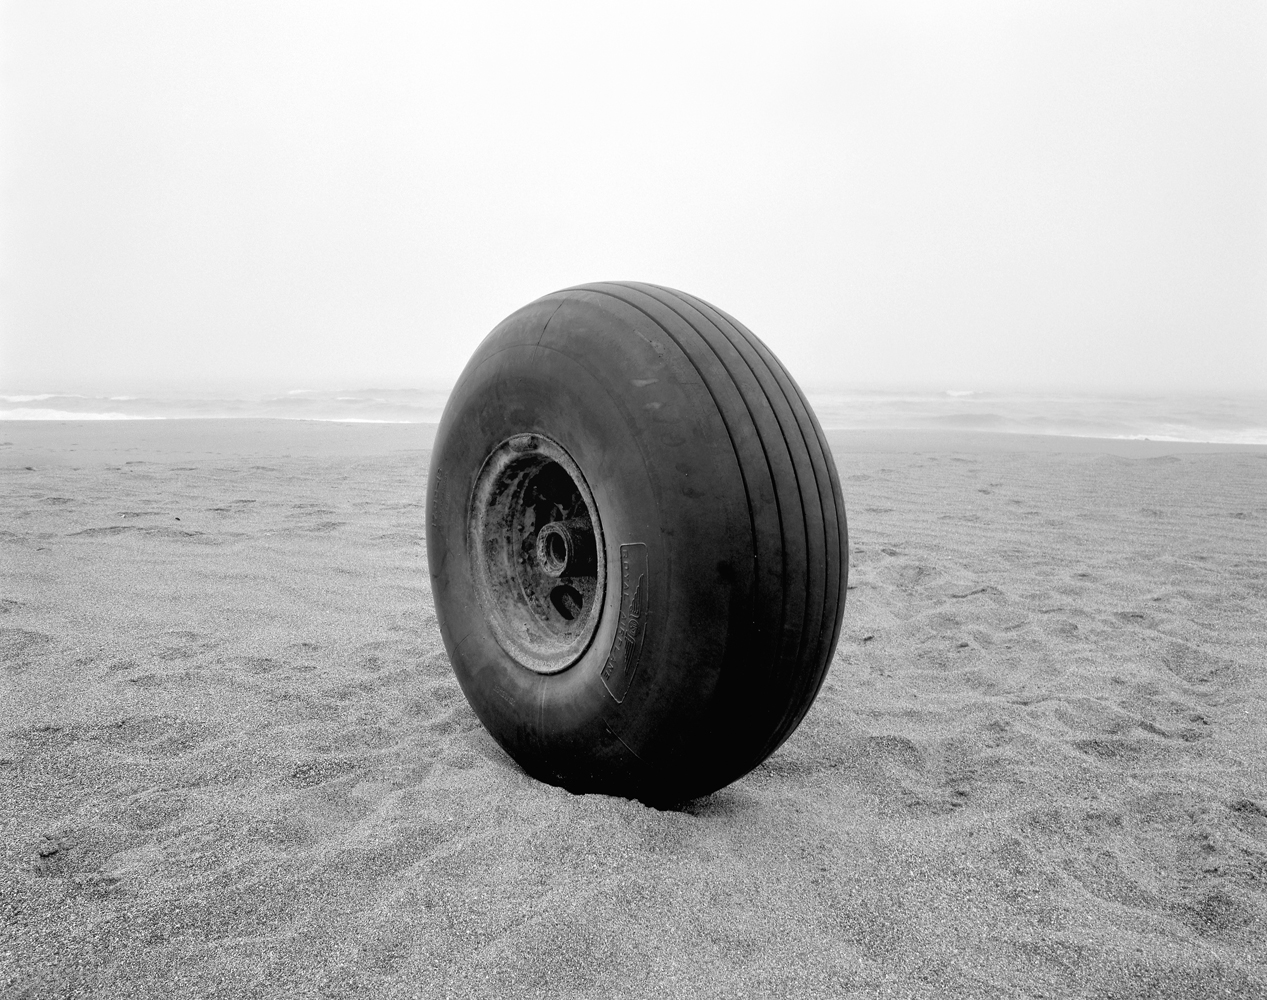 Airplane Wheel, the Great Beach